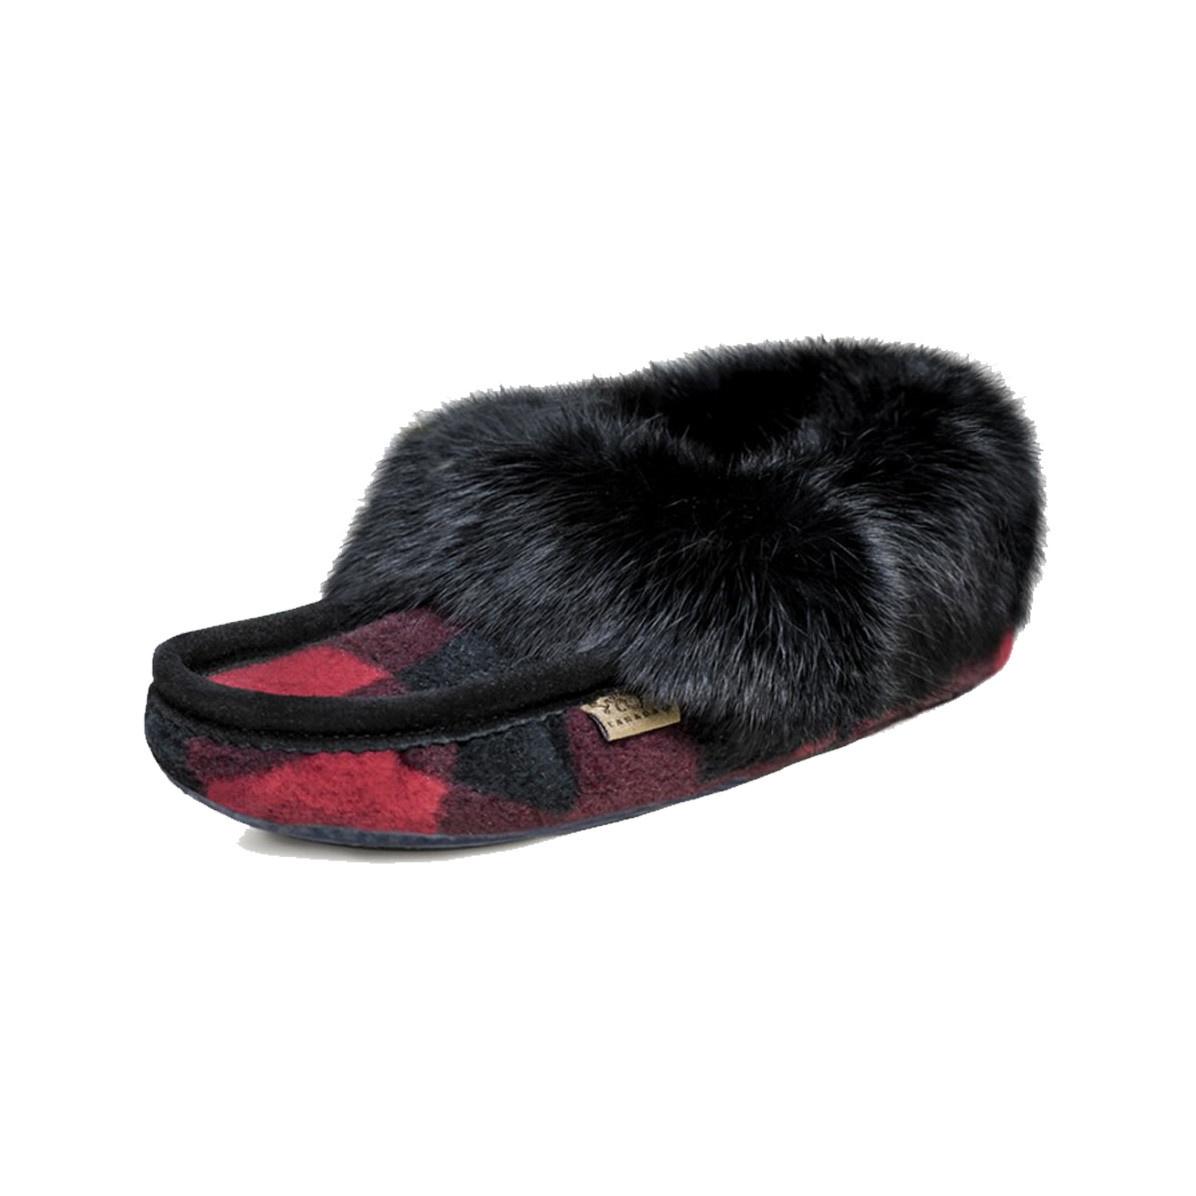 Laurentian Chief Women's Slipper Black 606BLL